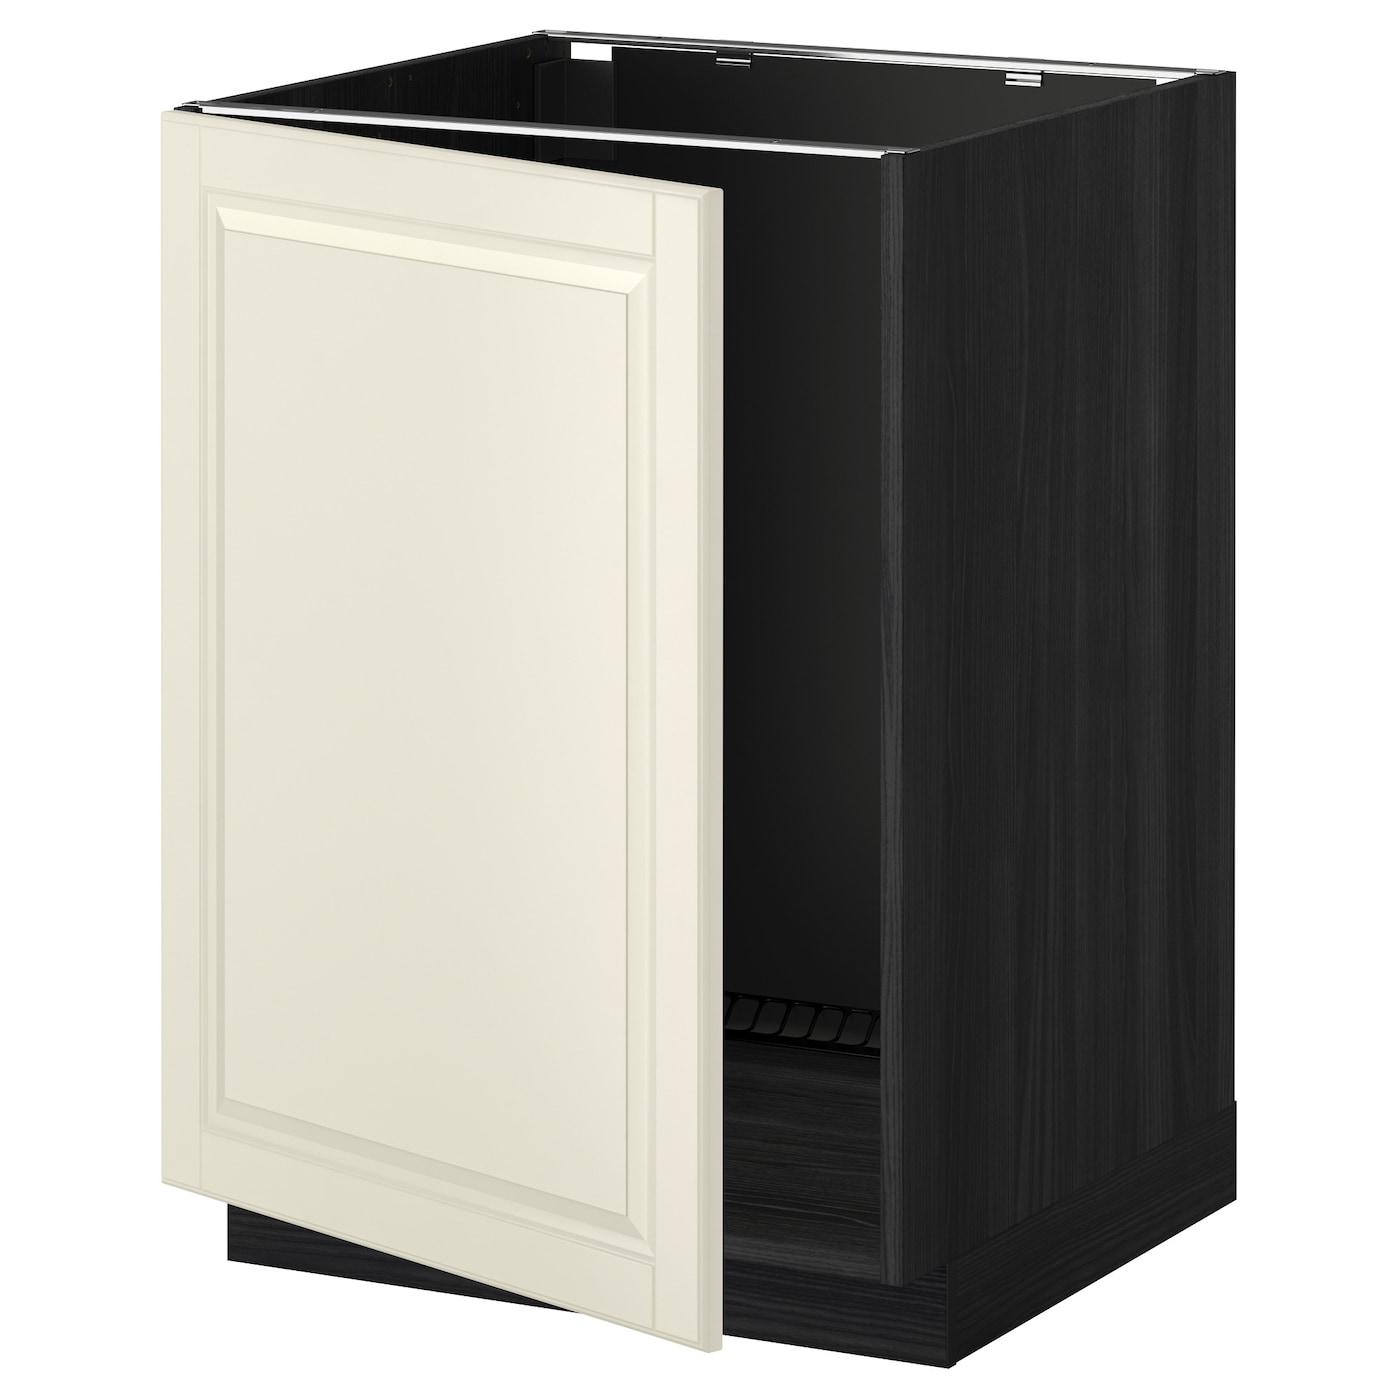 Metod Base Cabinet For Sink Black Järsta Orange 60x60 Cm: METOD Base Cabinet For Sink Black/bodbyn Off-white 60 X 60